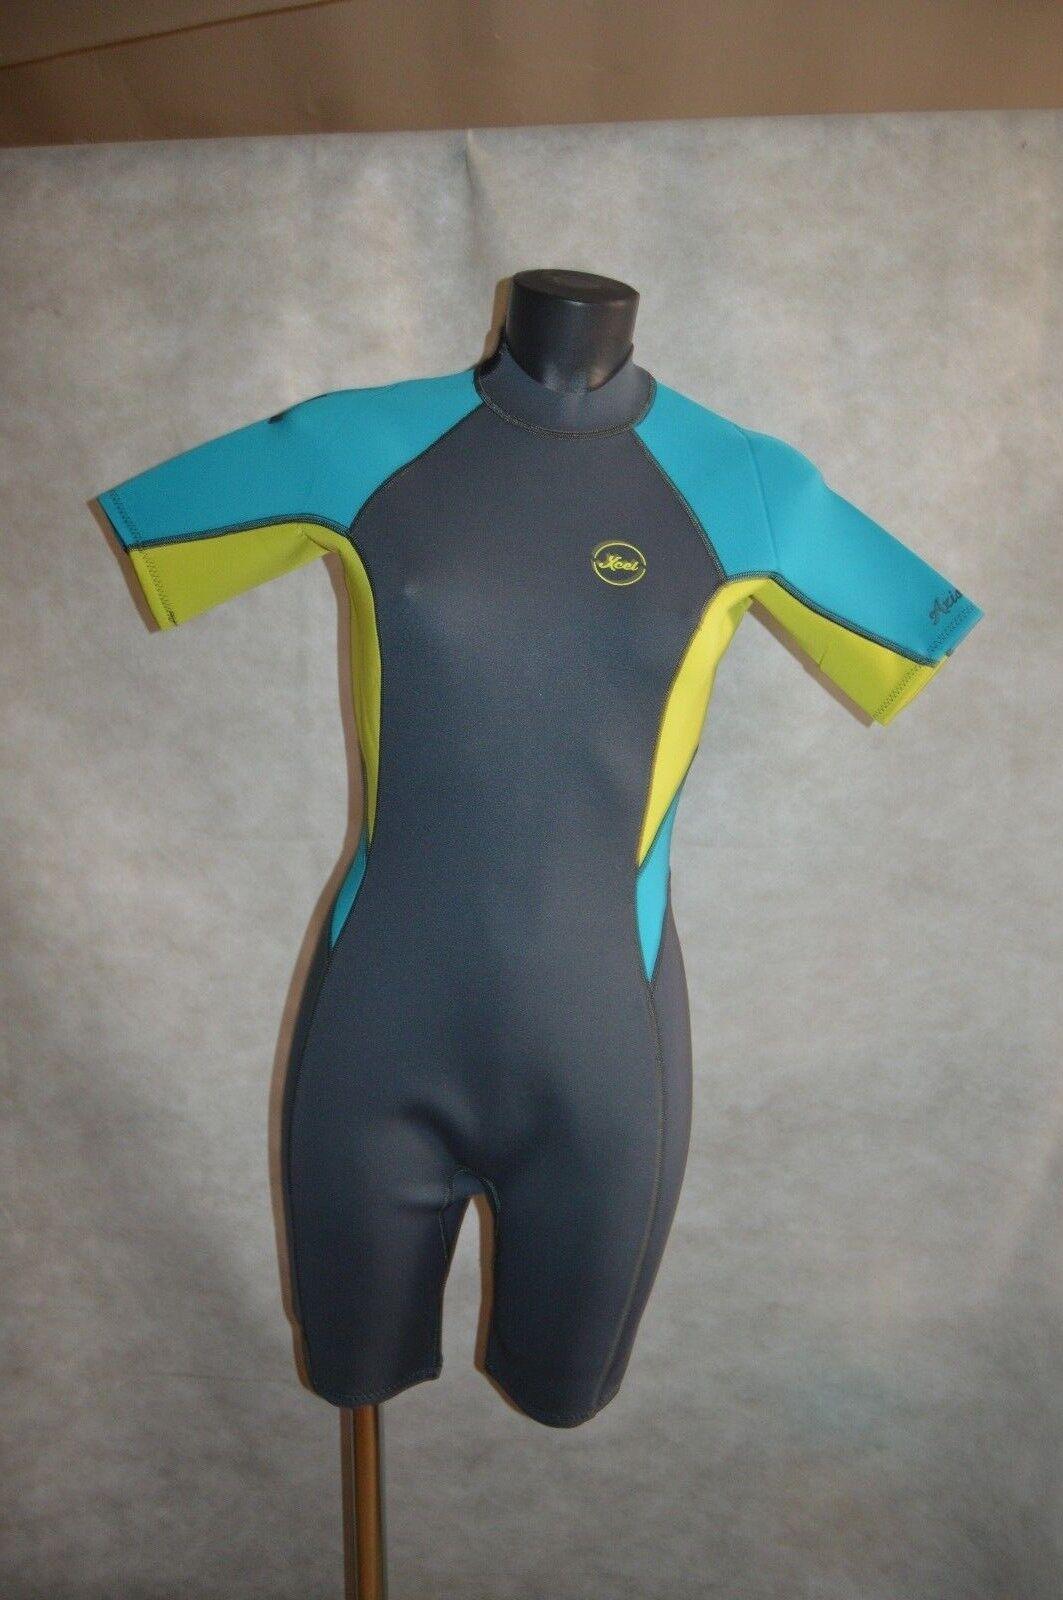 Playsuit Shorts 3 2 mm Xcel Iloma Size XXL Wetsuit Surf Windsurf New 14